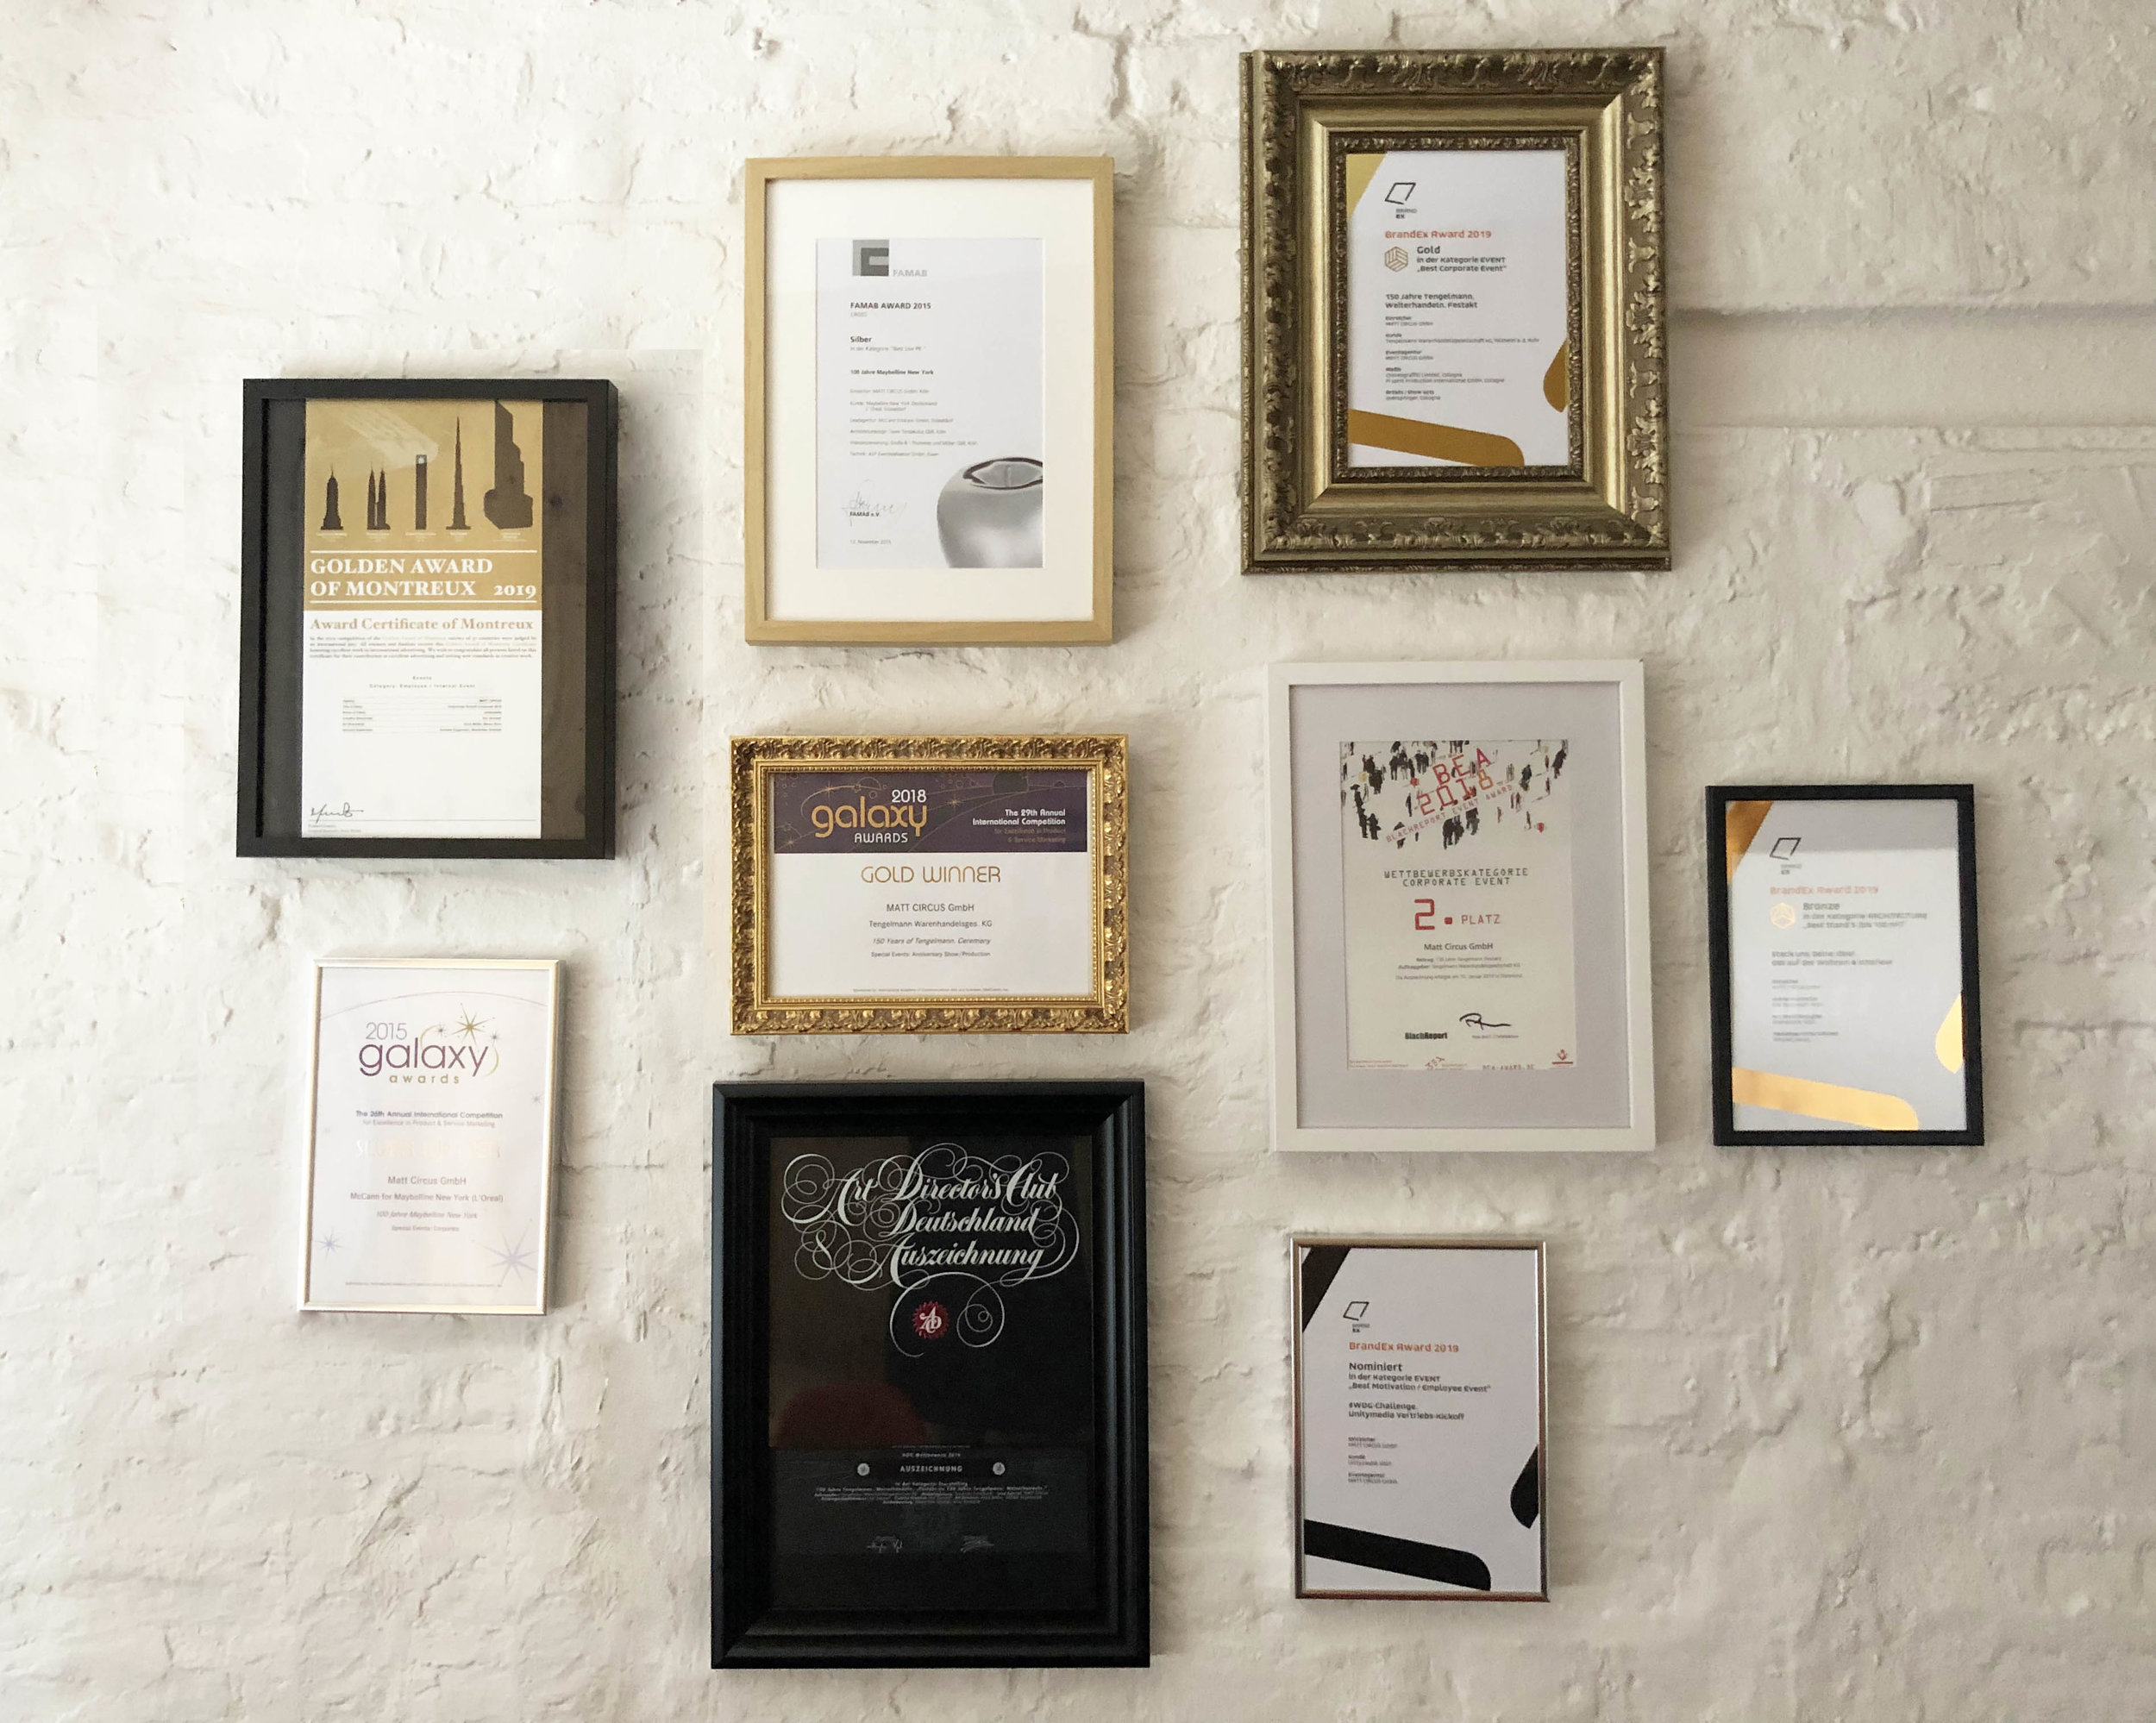 mattcircus-agentur-koeln-live-kommunikation-arward-winner-golden-award-of-montreux-unitymedia-urkunde-awardurkundenbacksteinmauer.jpg